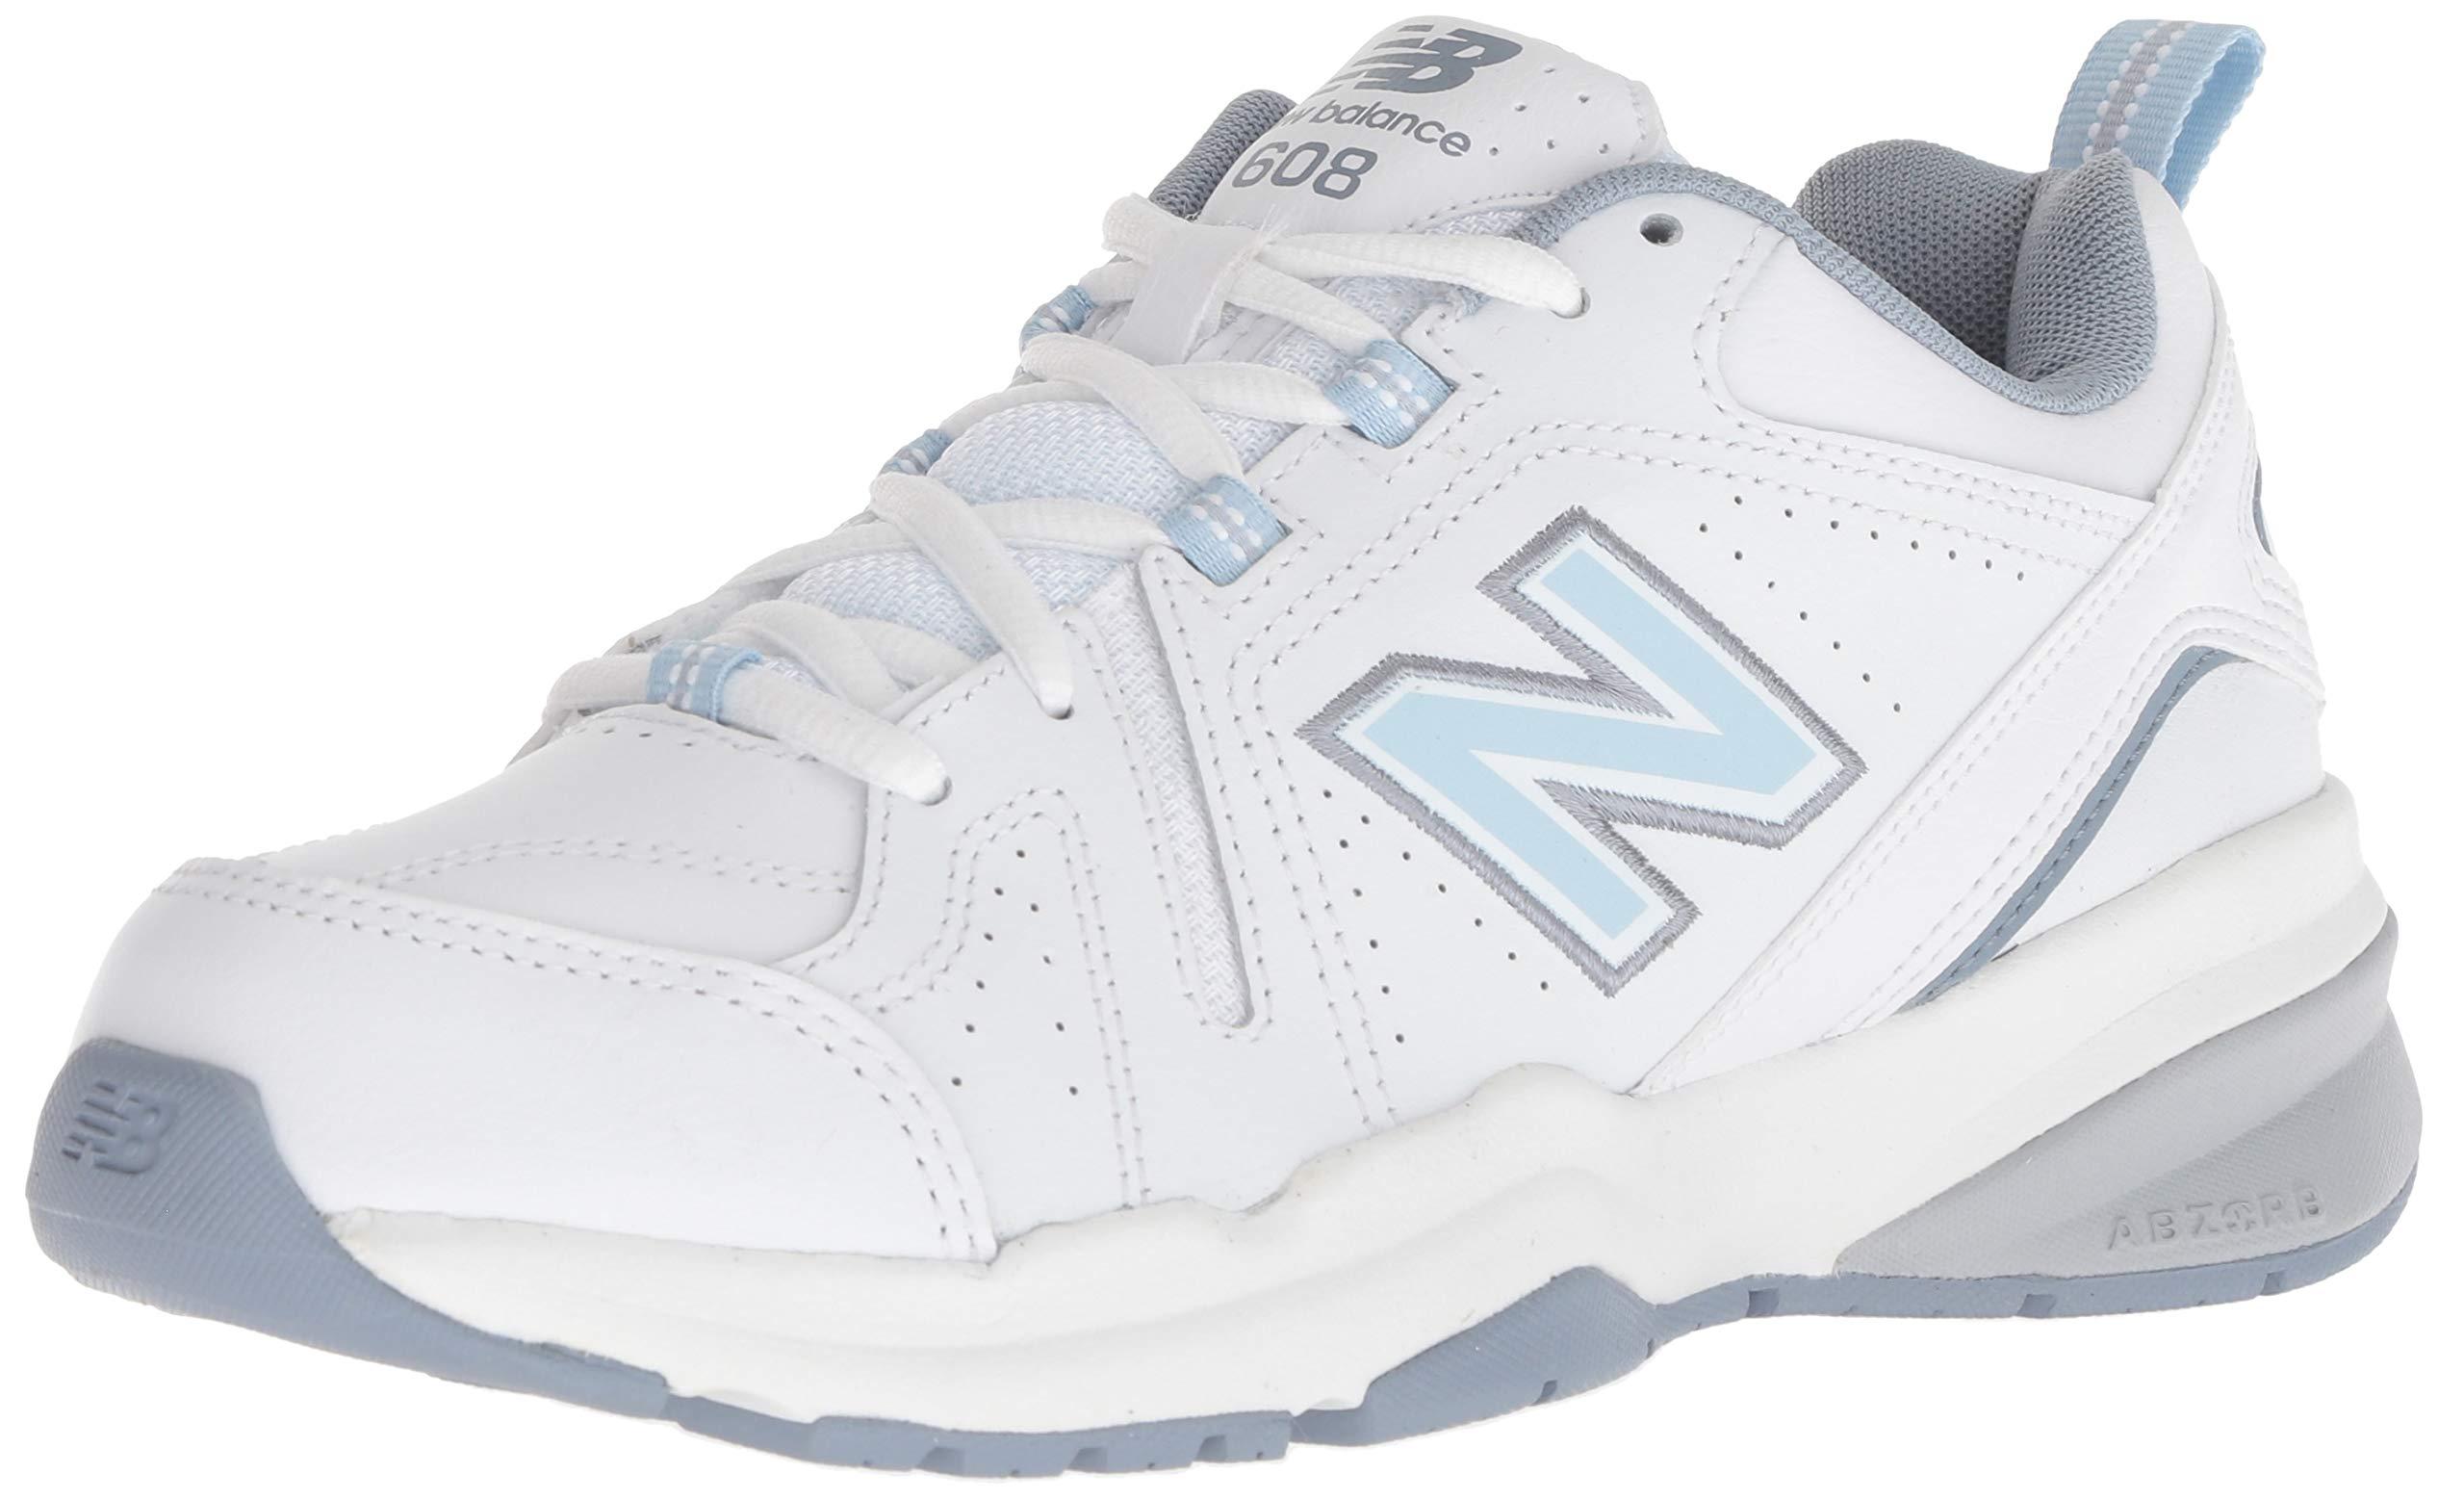 new balance Women's 608v5 Casual Comfort Cross Trainer, White/Light Blue, 9 W US by New Balance